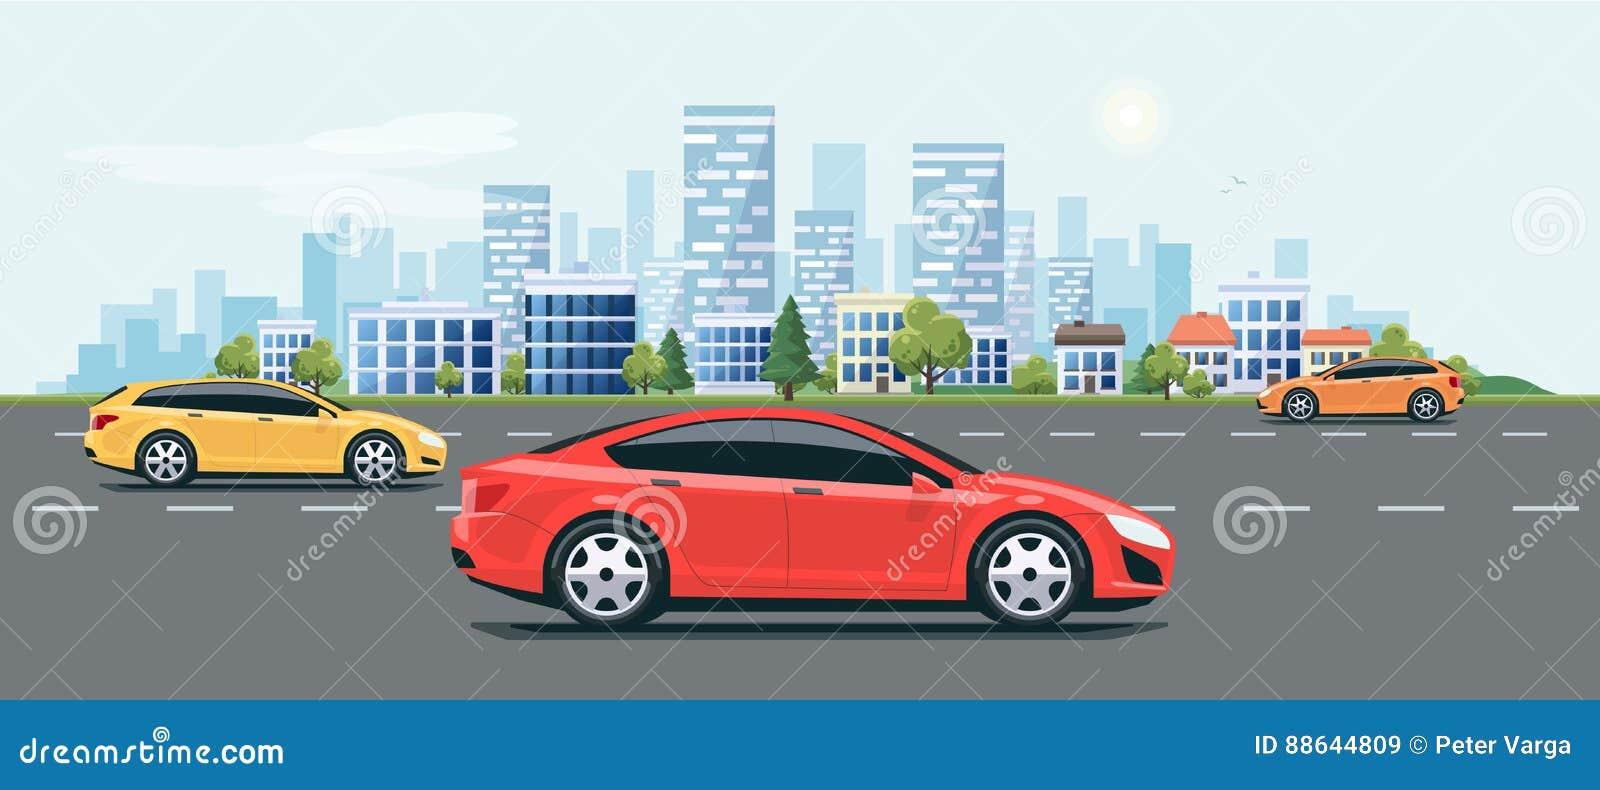 e54b13942c Flat vector cartoon style illustration of urban landscape city street with  cars